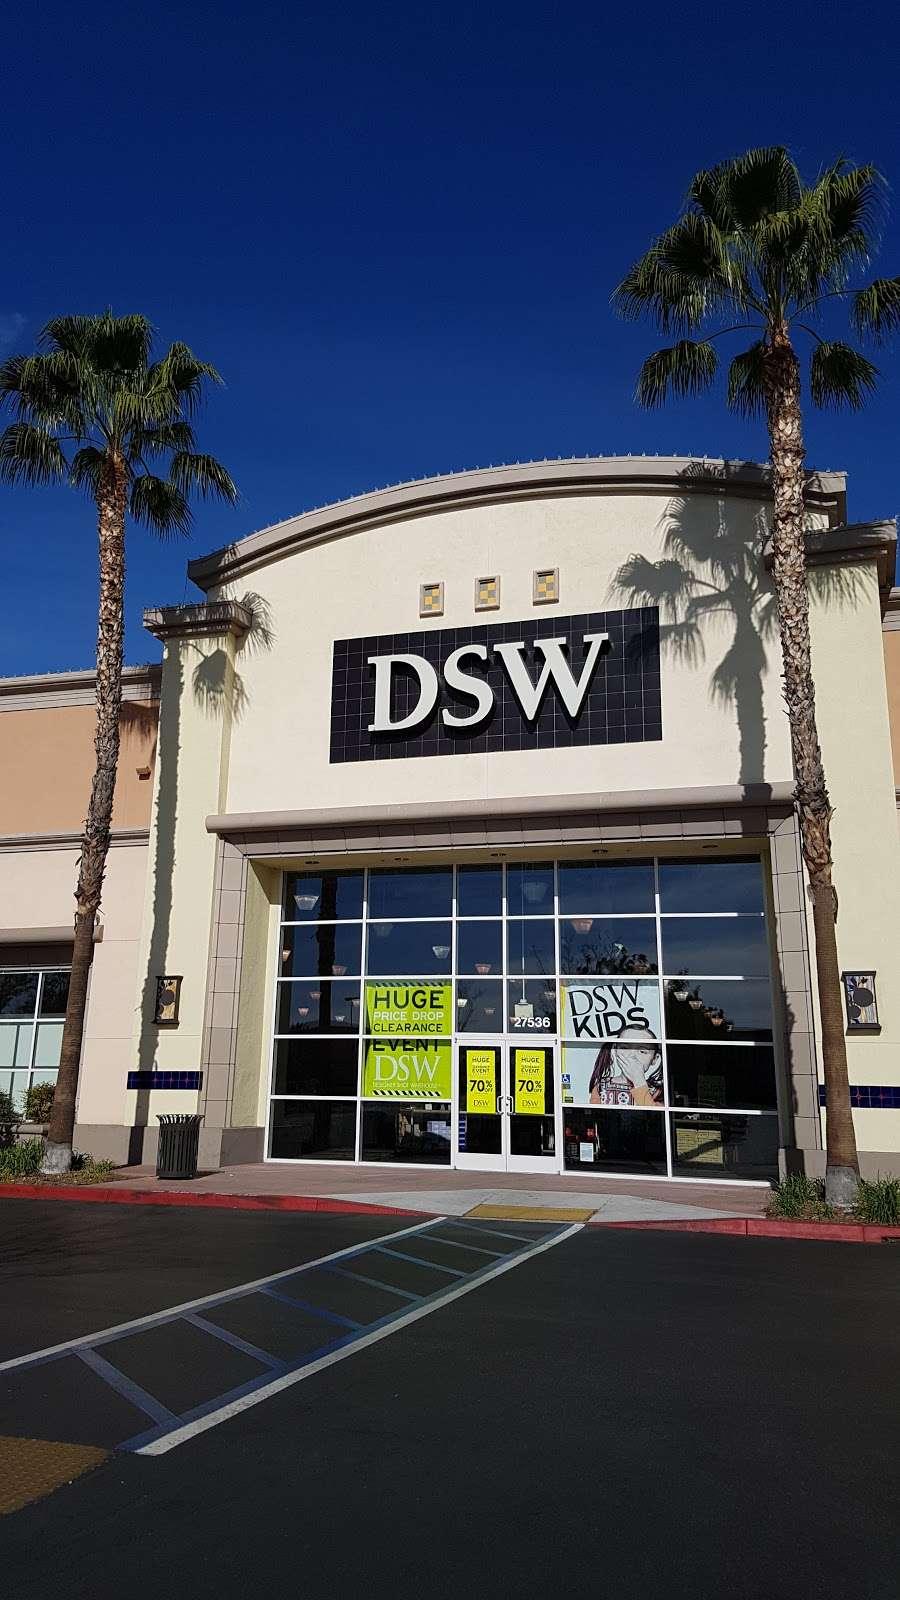 DSW Designer Shoe Warehouse, 27536 W